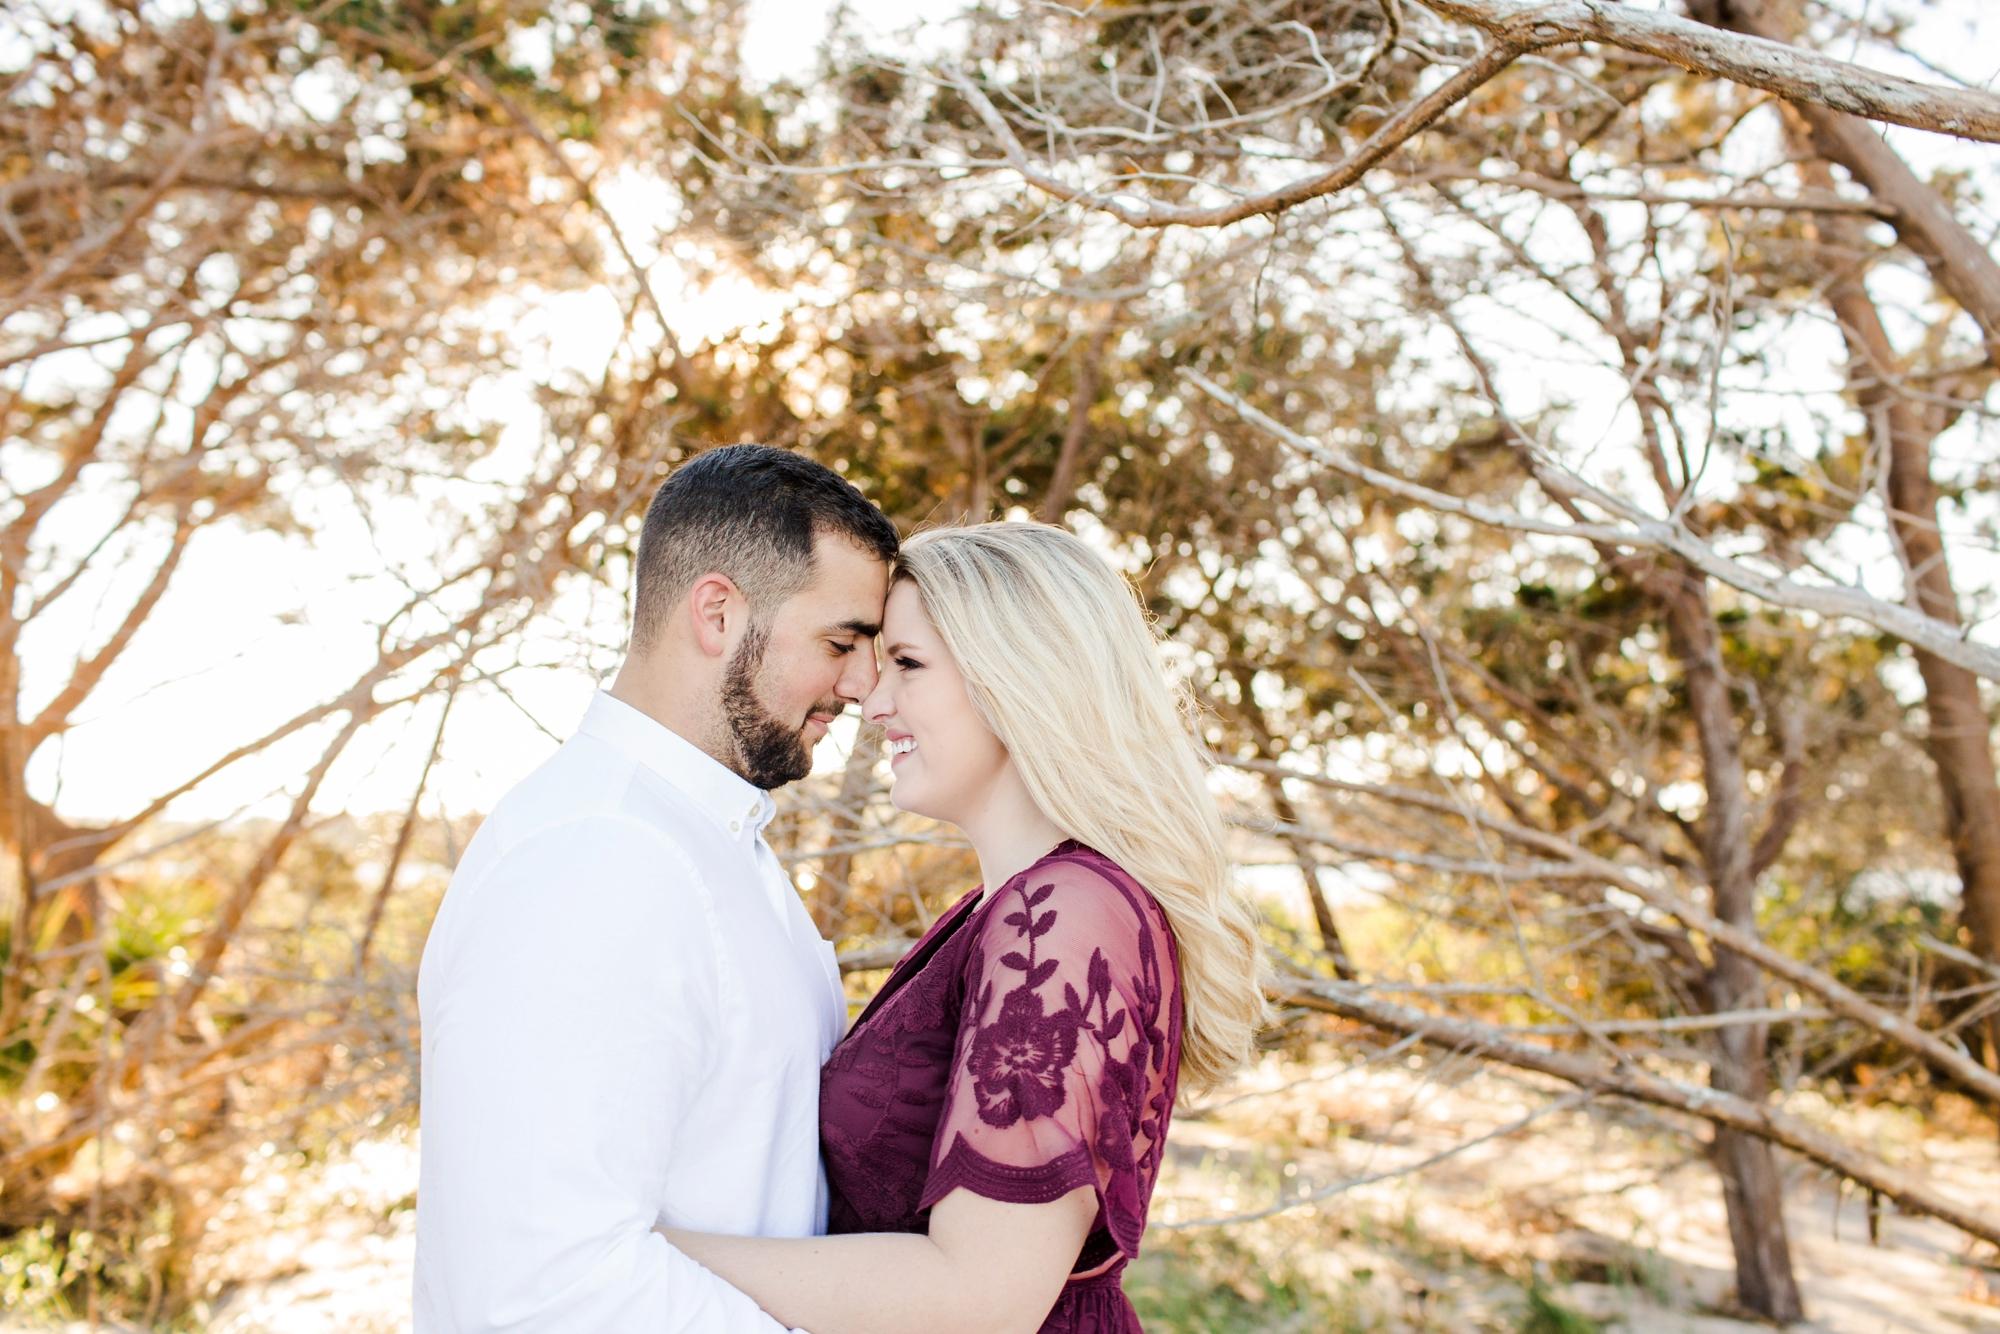 Natalie Broach Photography-Steven & Lauren Engagement Session, Big Talbot Island. Jacksonville Florida